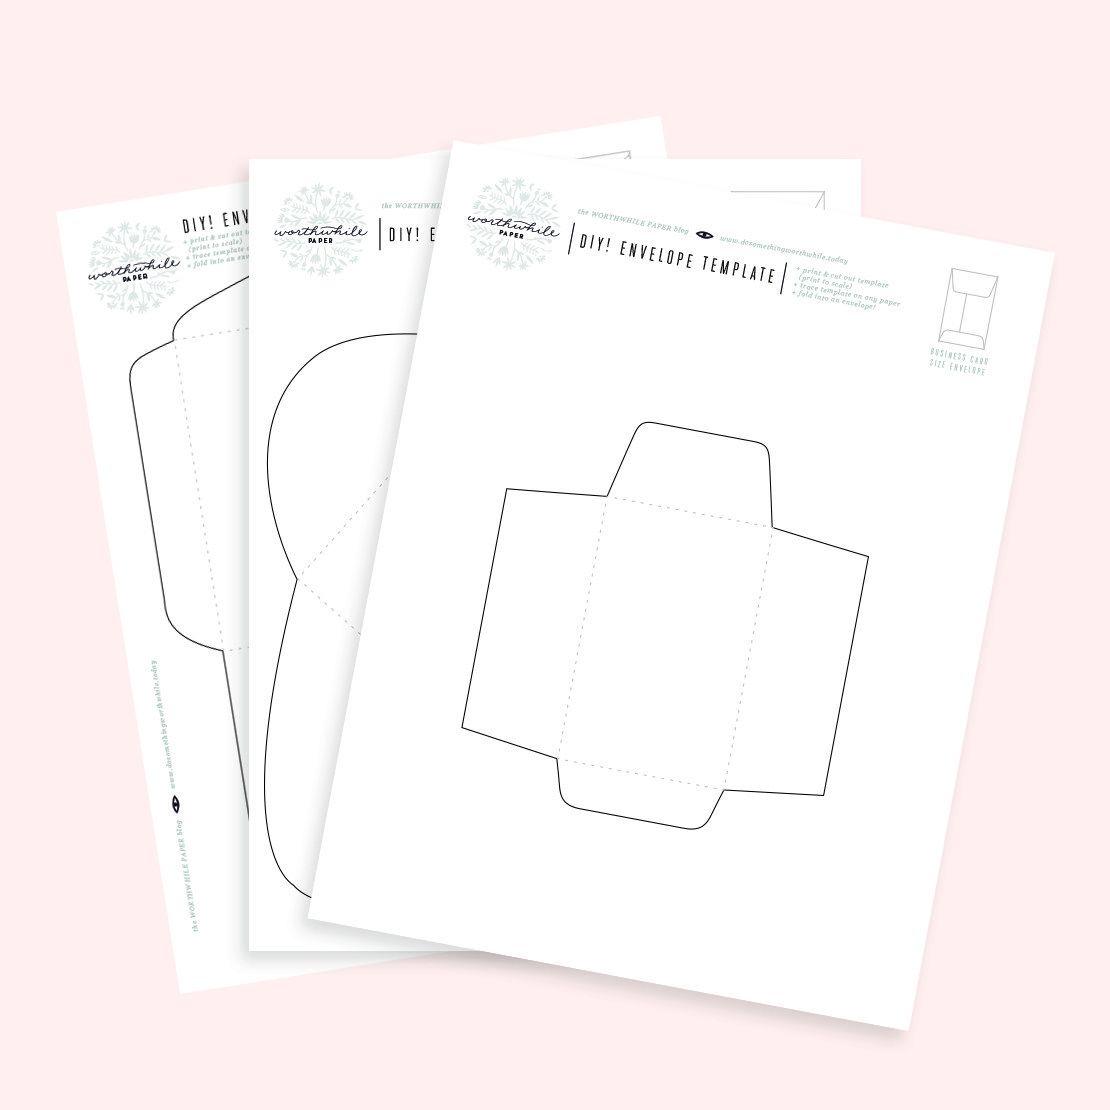 011 Surprising Gift Card Envelope Template Inspiration  Templates Voucher Diy Free PrintableFull